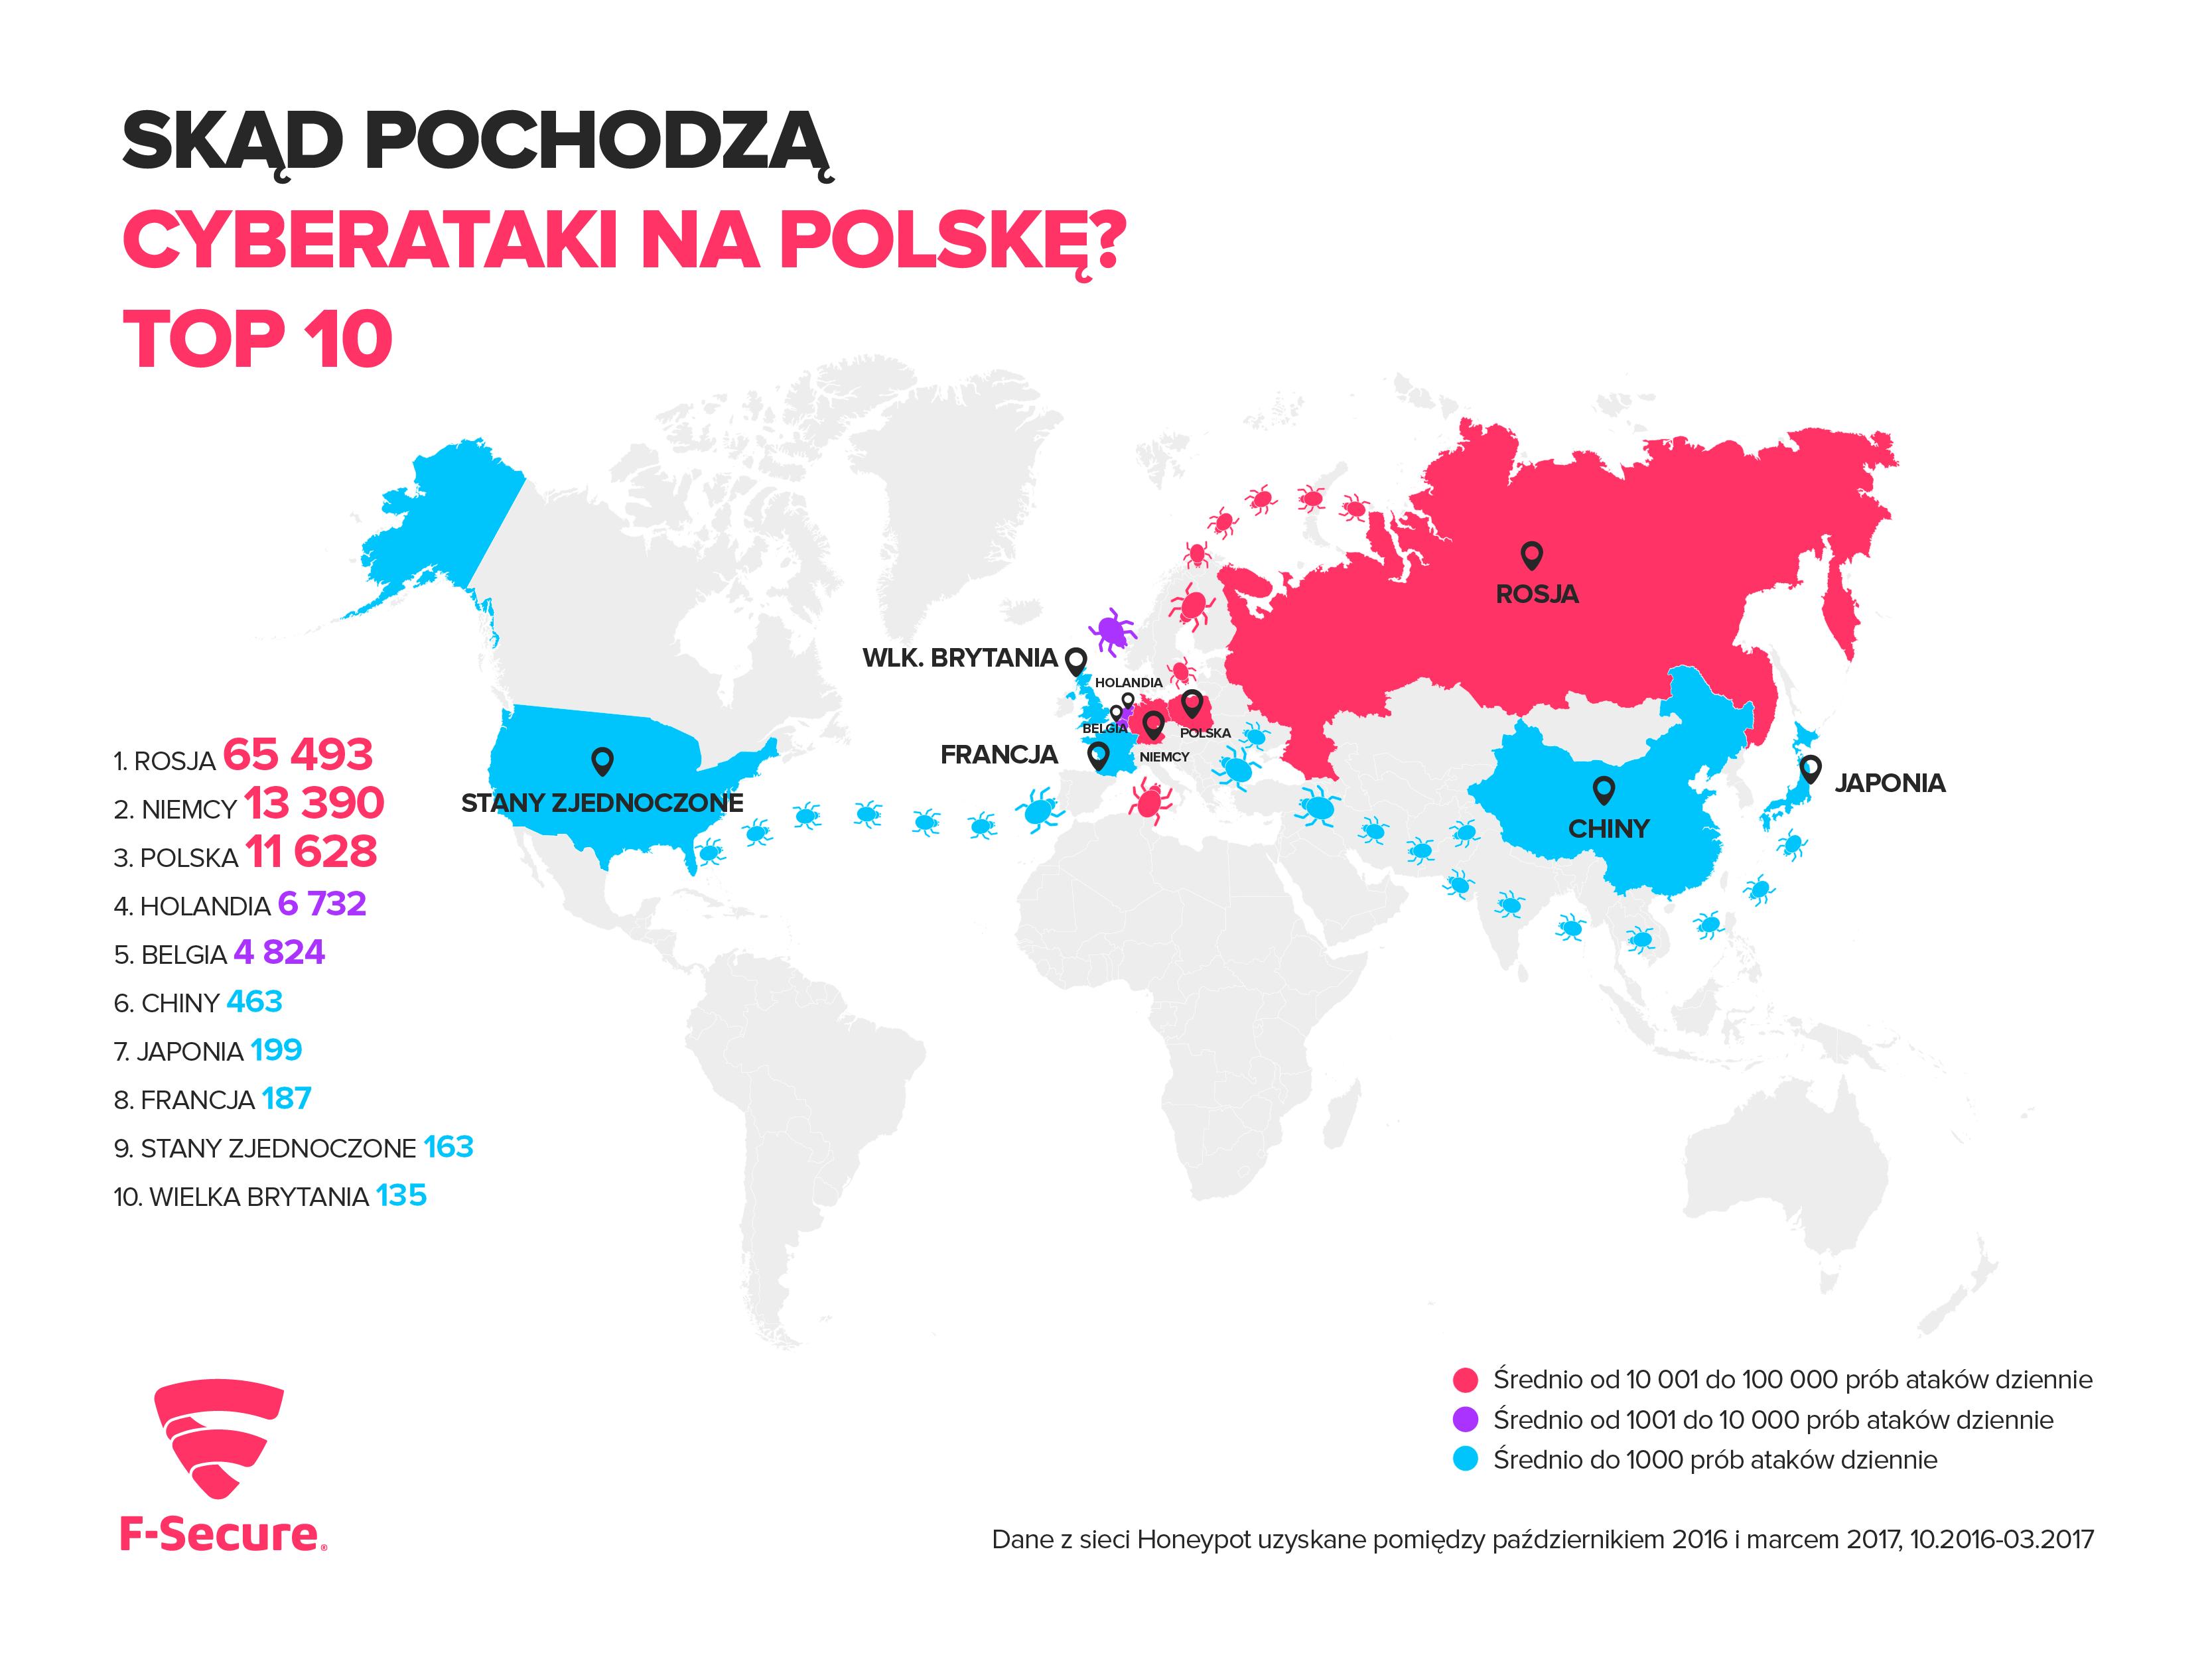 Cyberataki na Polskę F-Secure